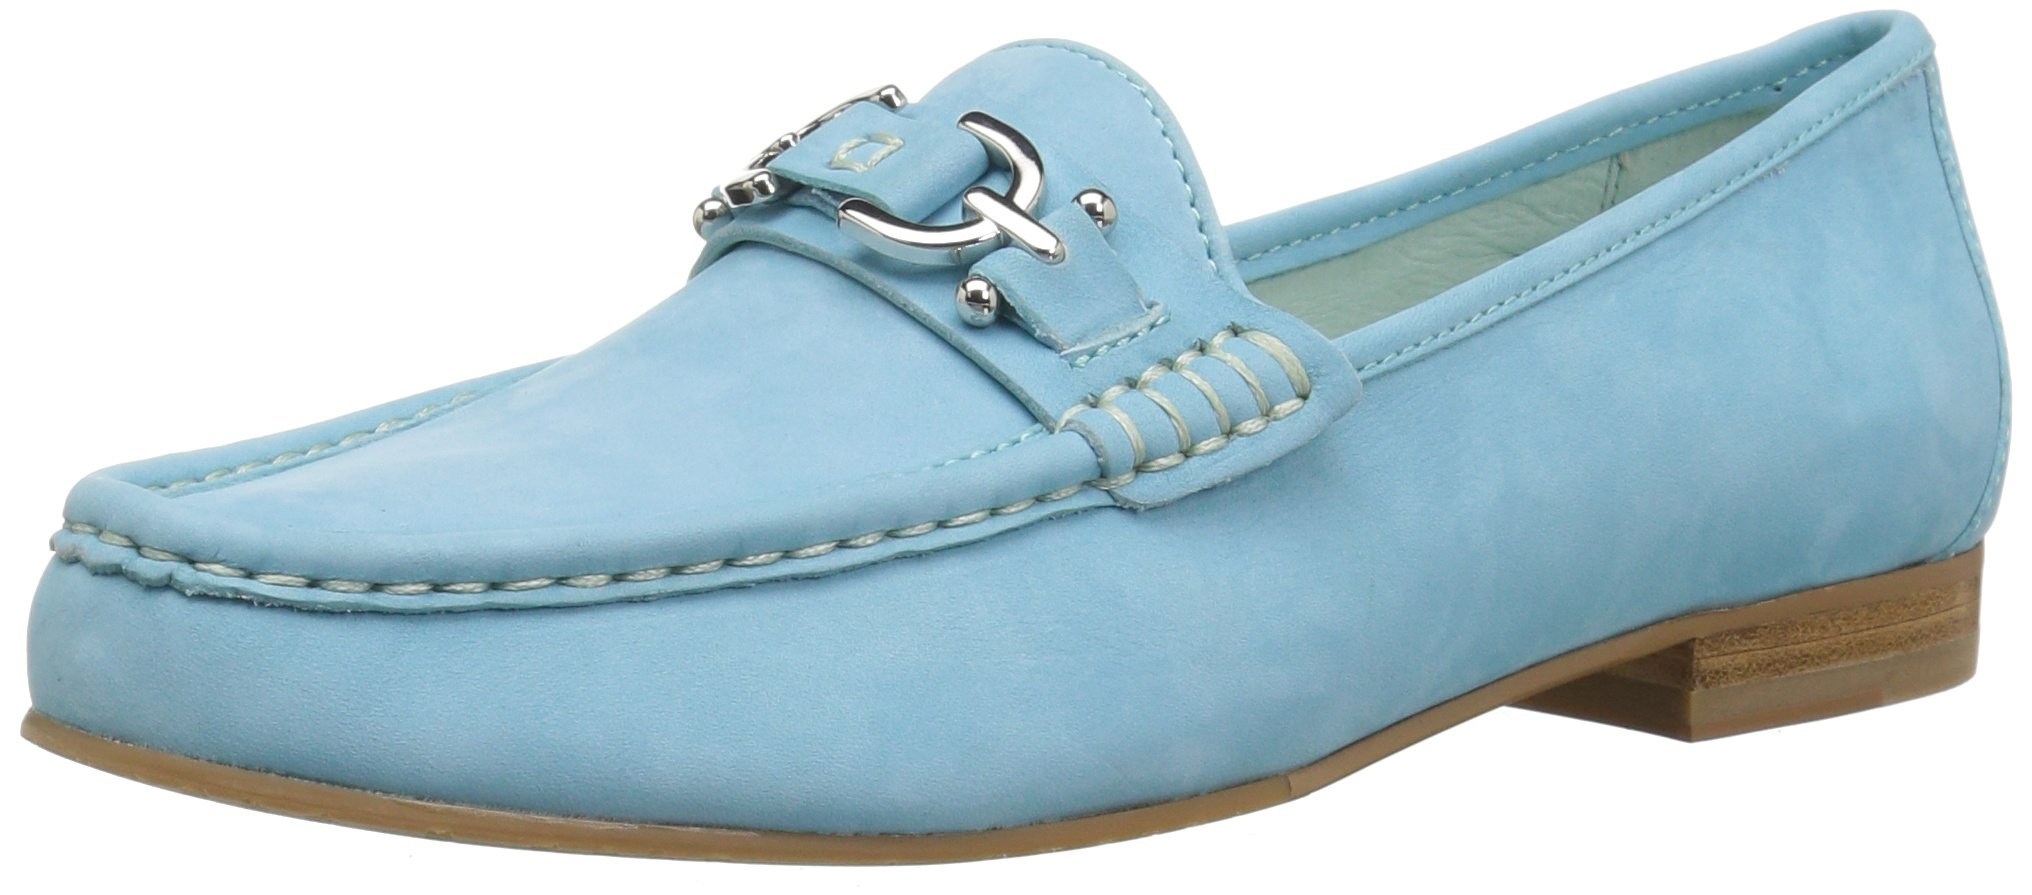 Donald J Pliner Women's Suzy Loafer Flat, Capri, 10 Medium US